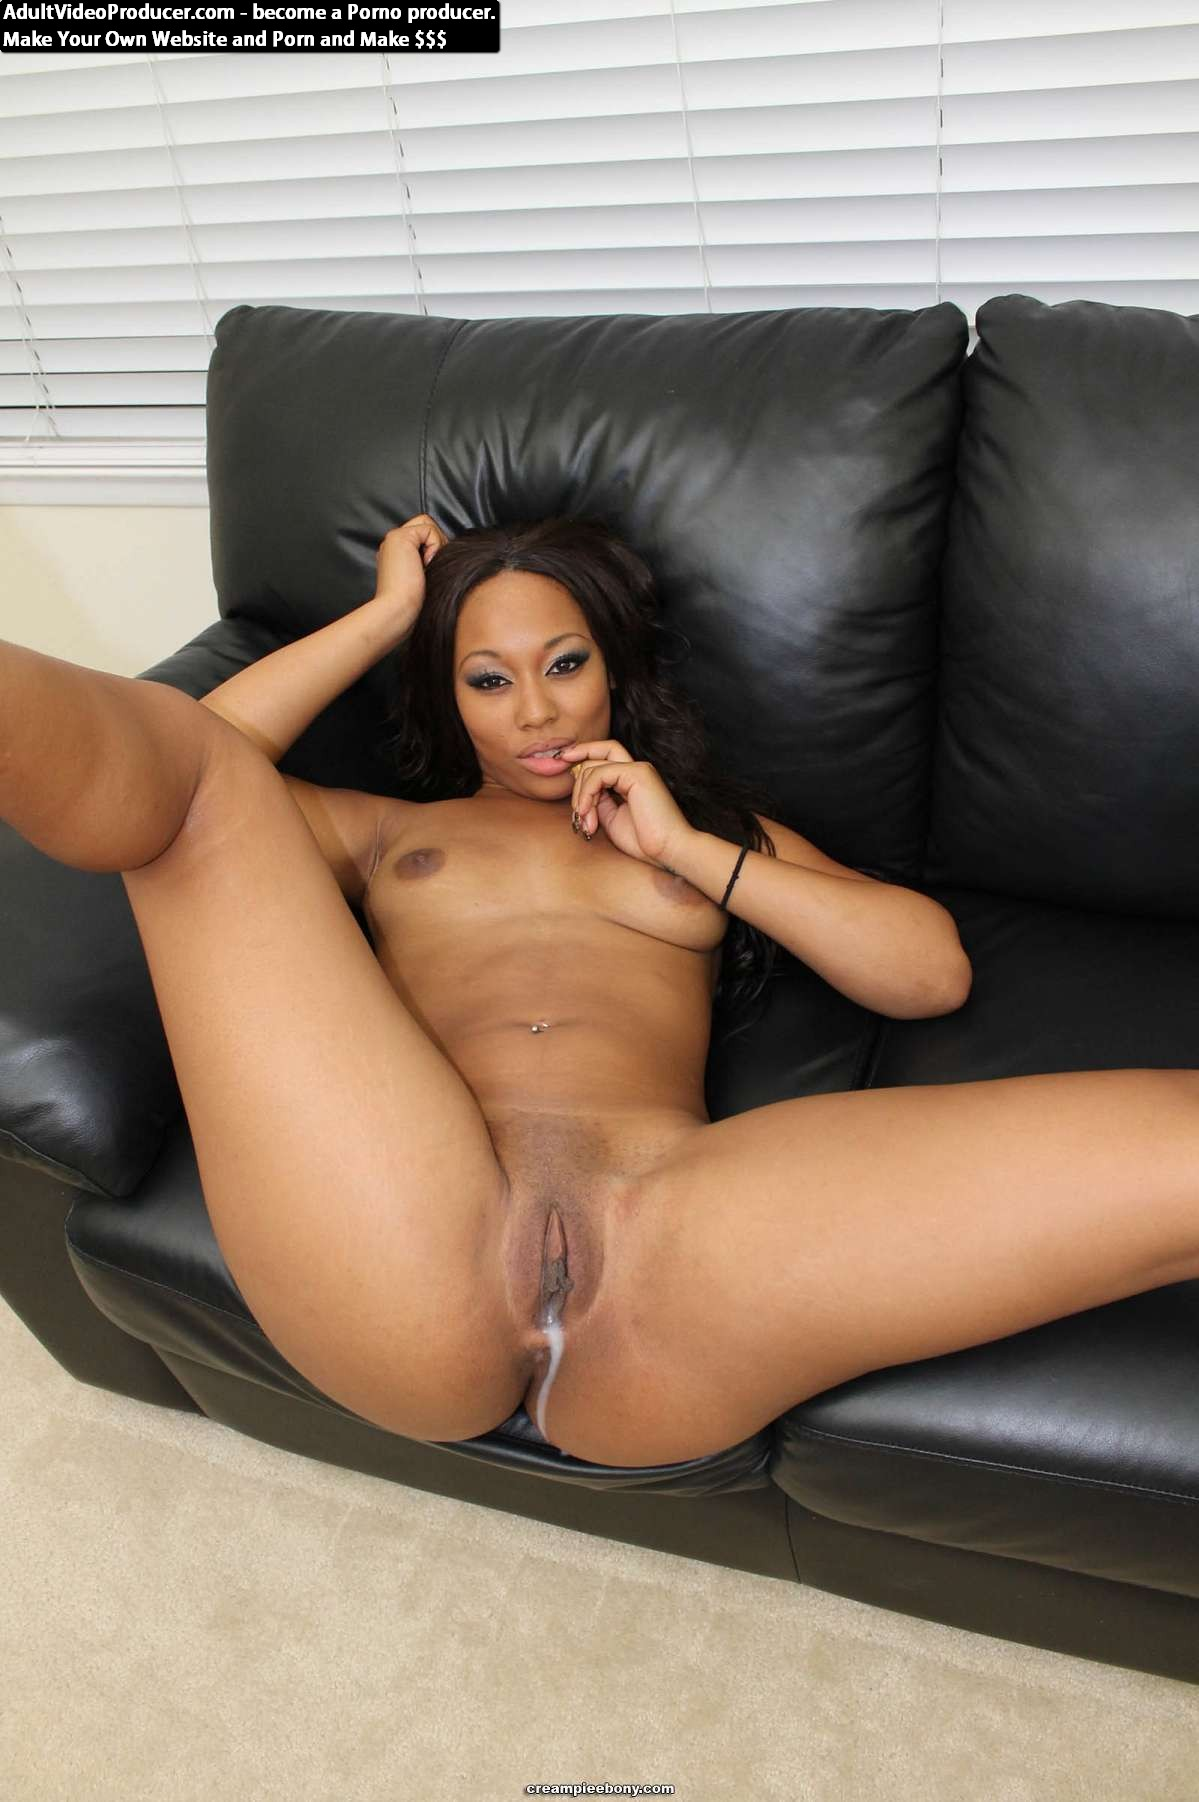 Leilani Leeane creampie : Ebony Creampies